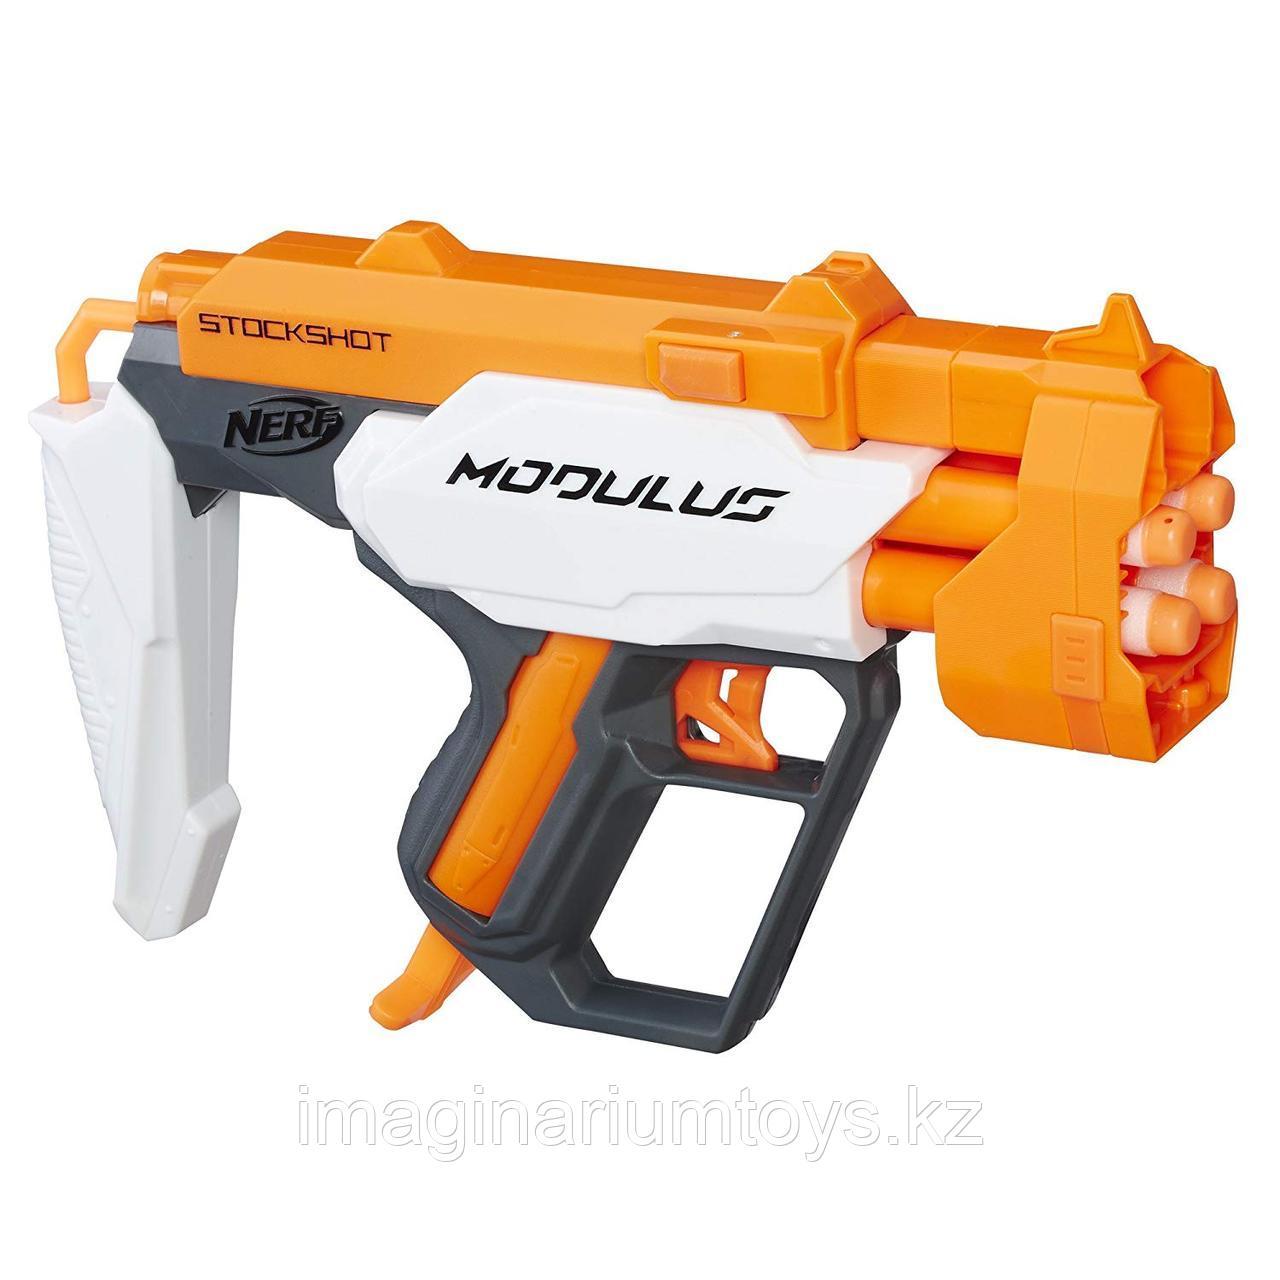 Бластер Нерф Nerf «Modulus StockShot»